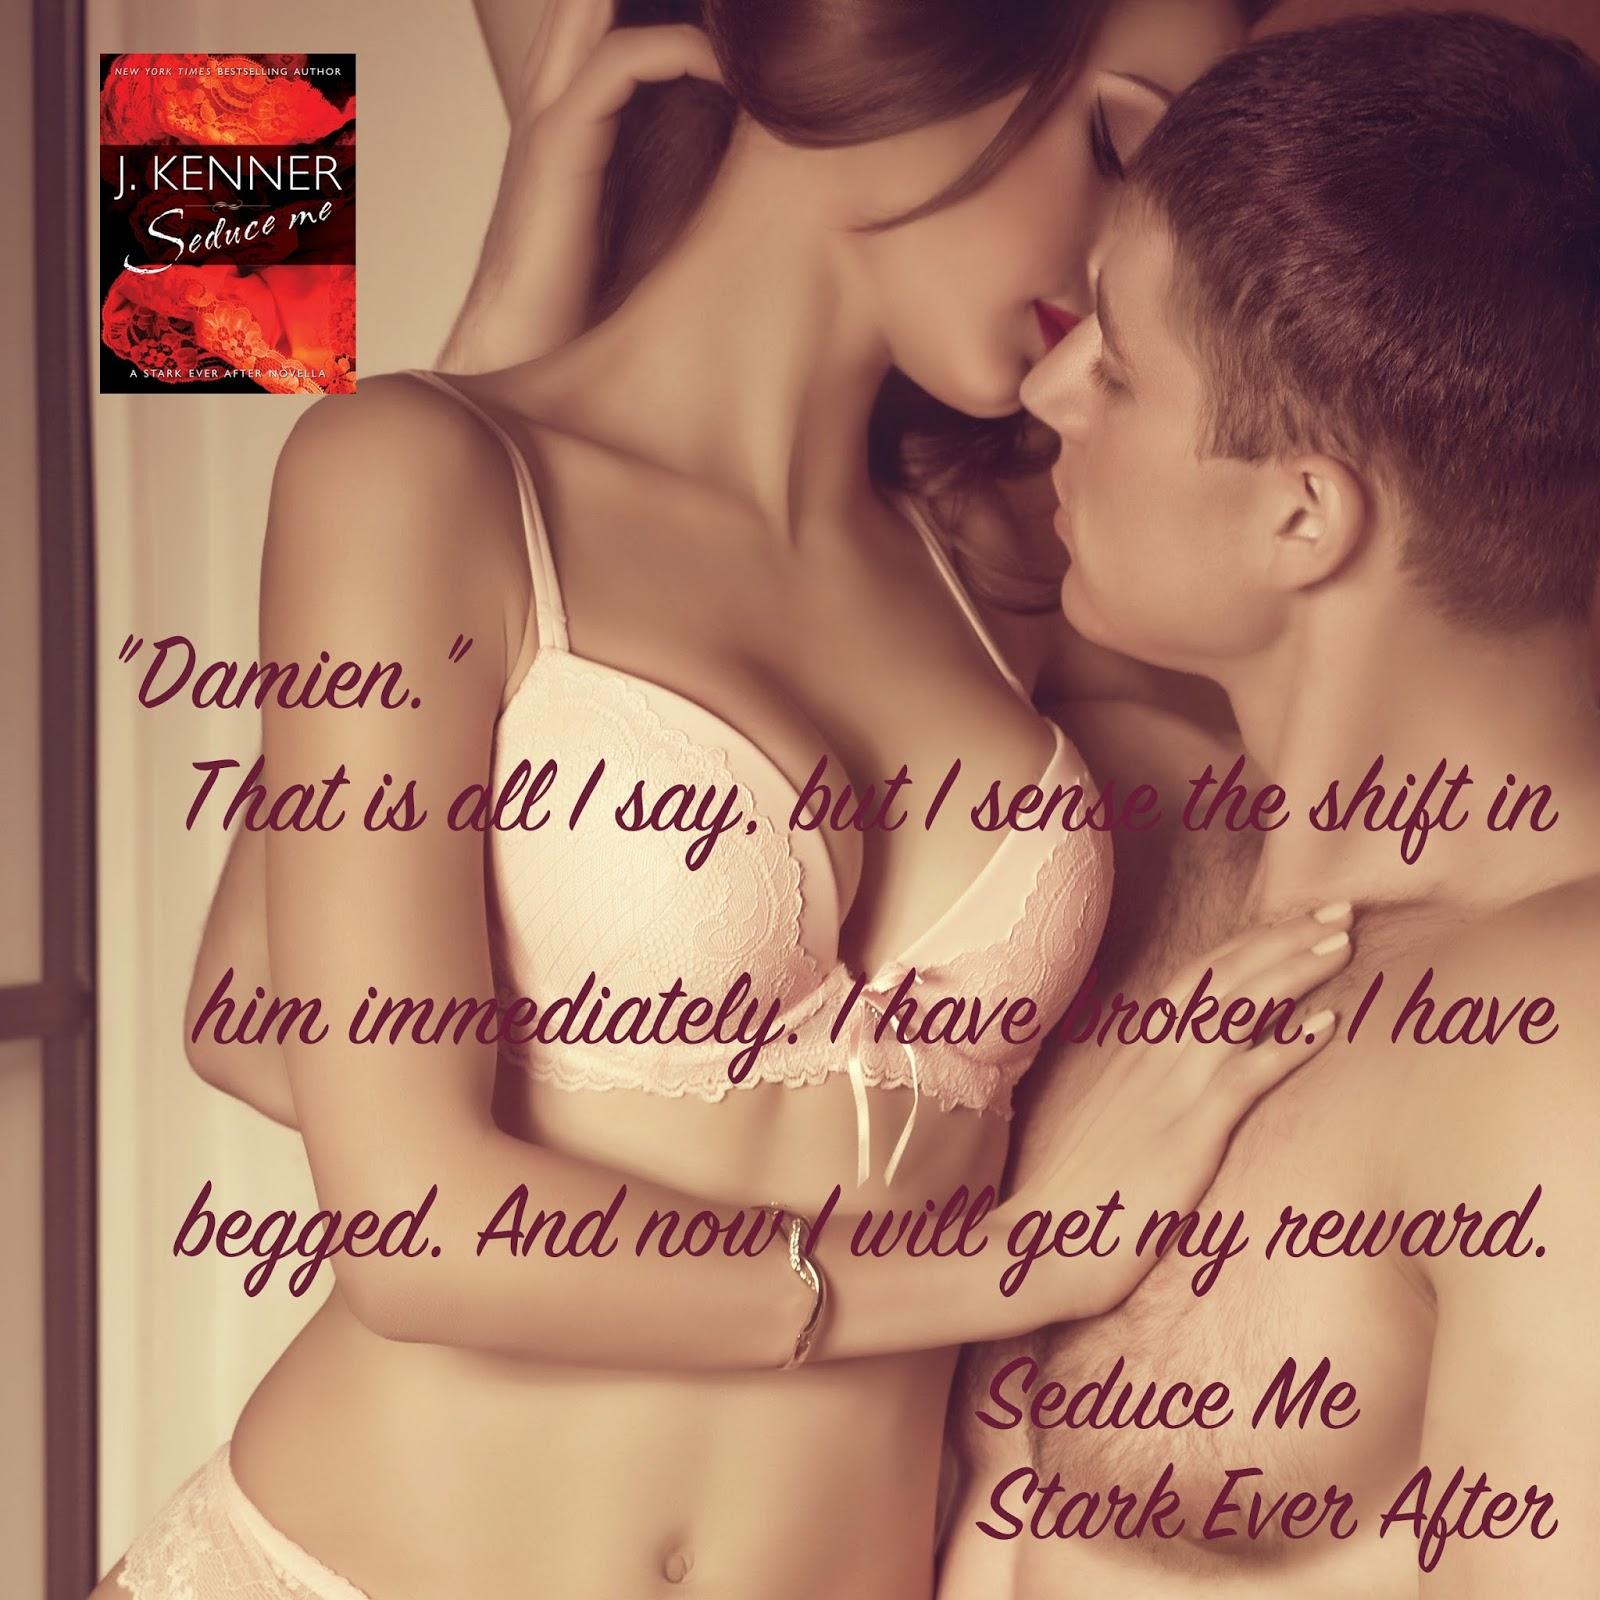 seduce mature women book